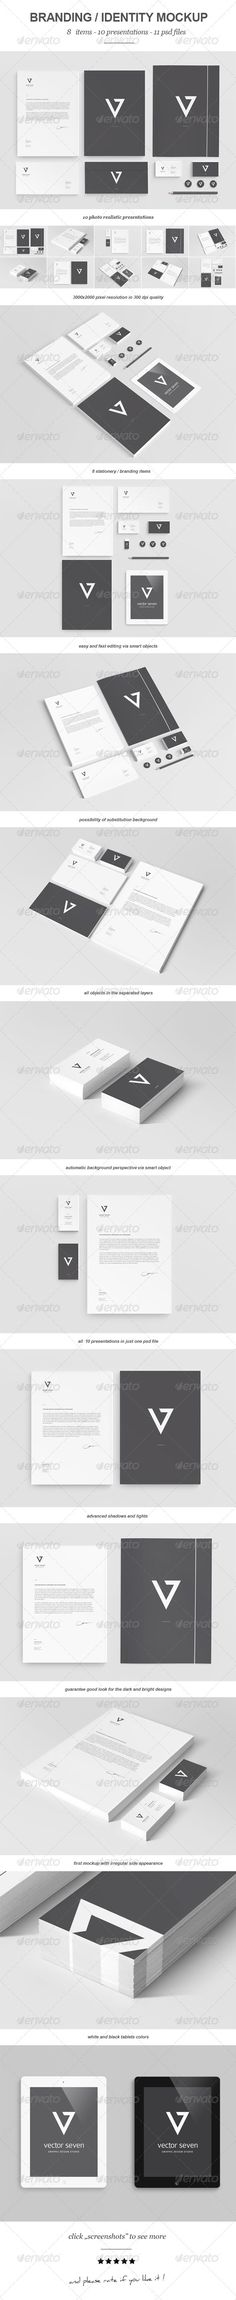 Branding / Identity Mock-up II